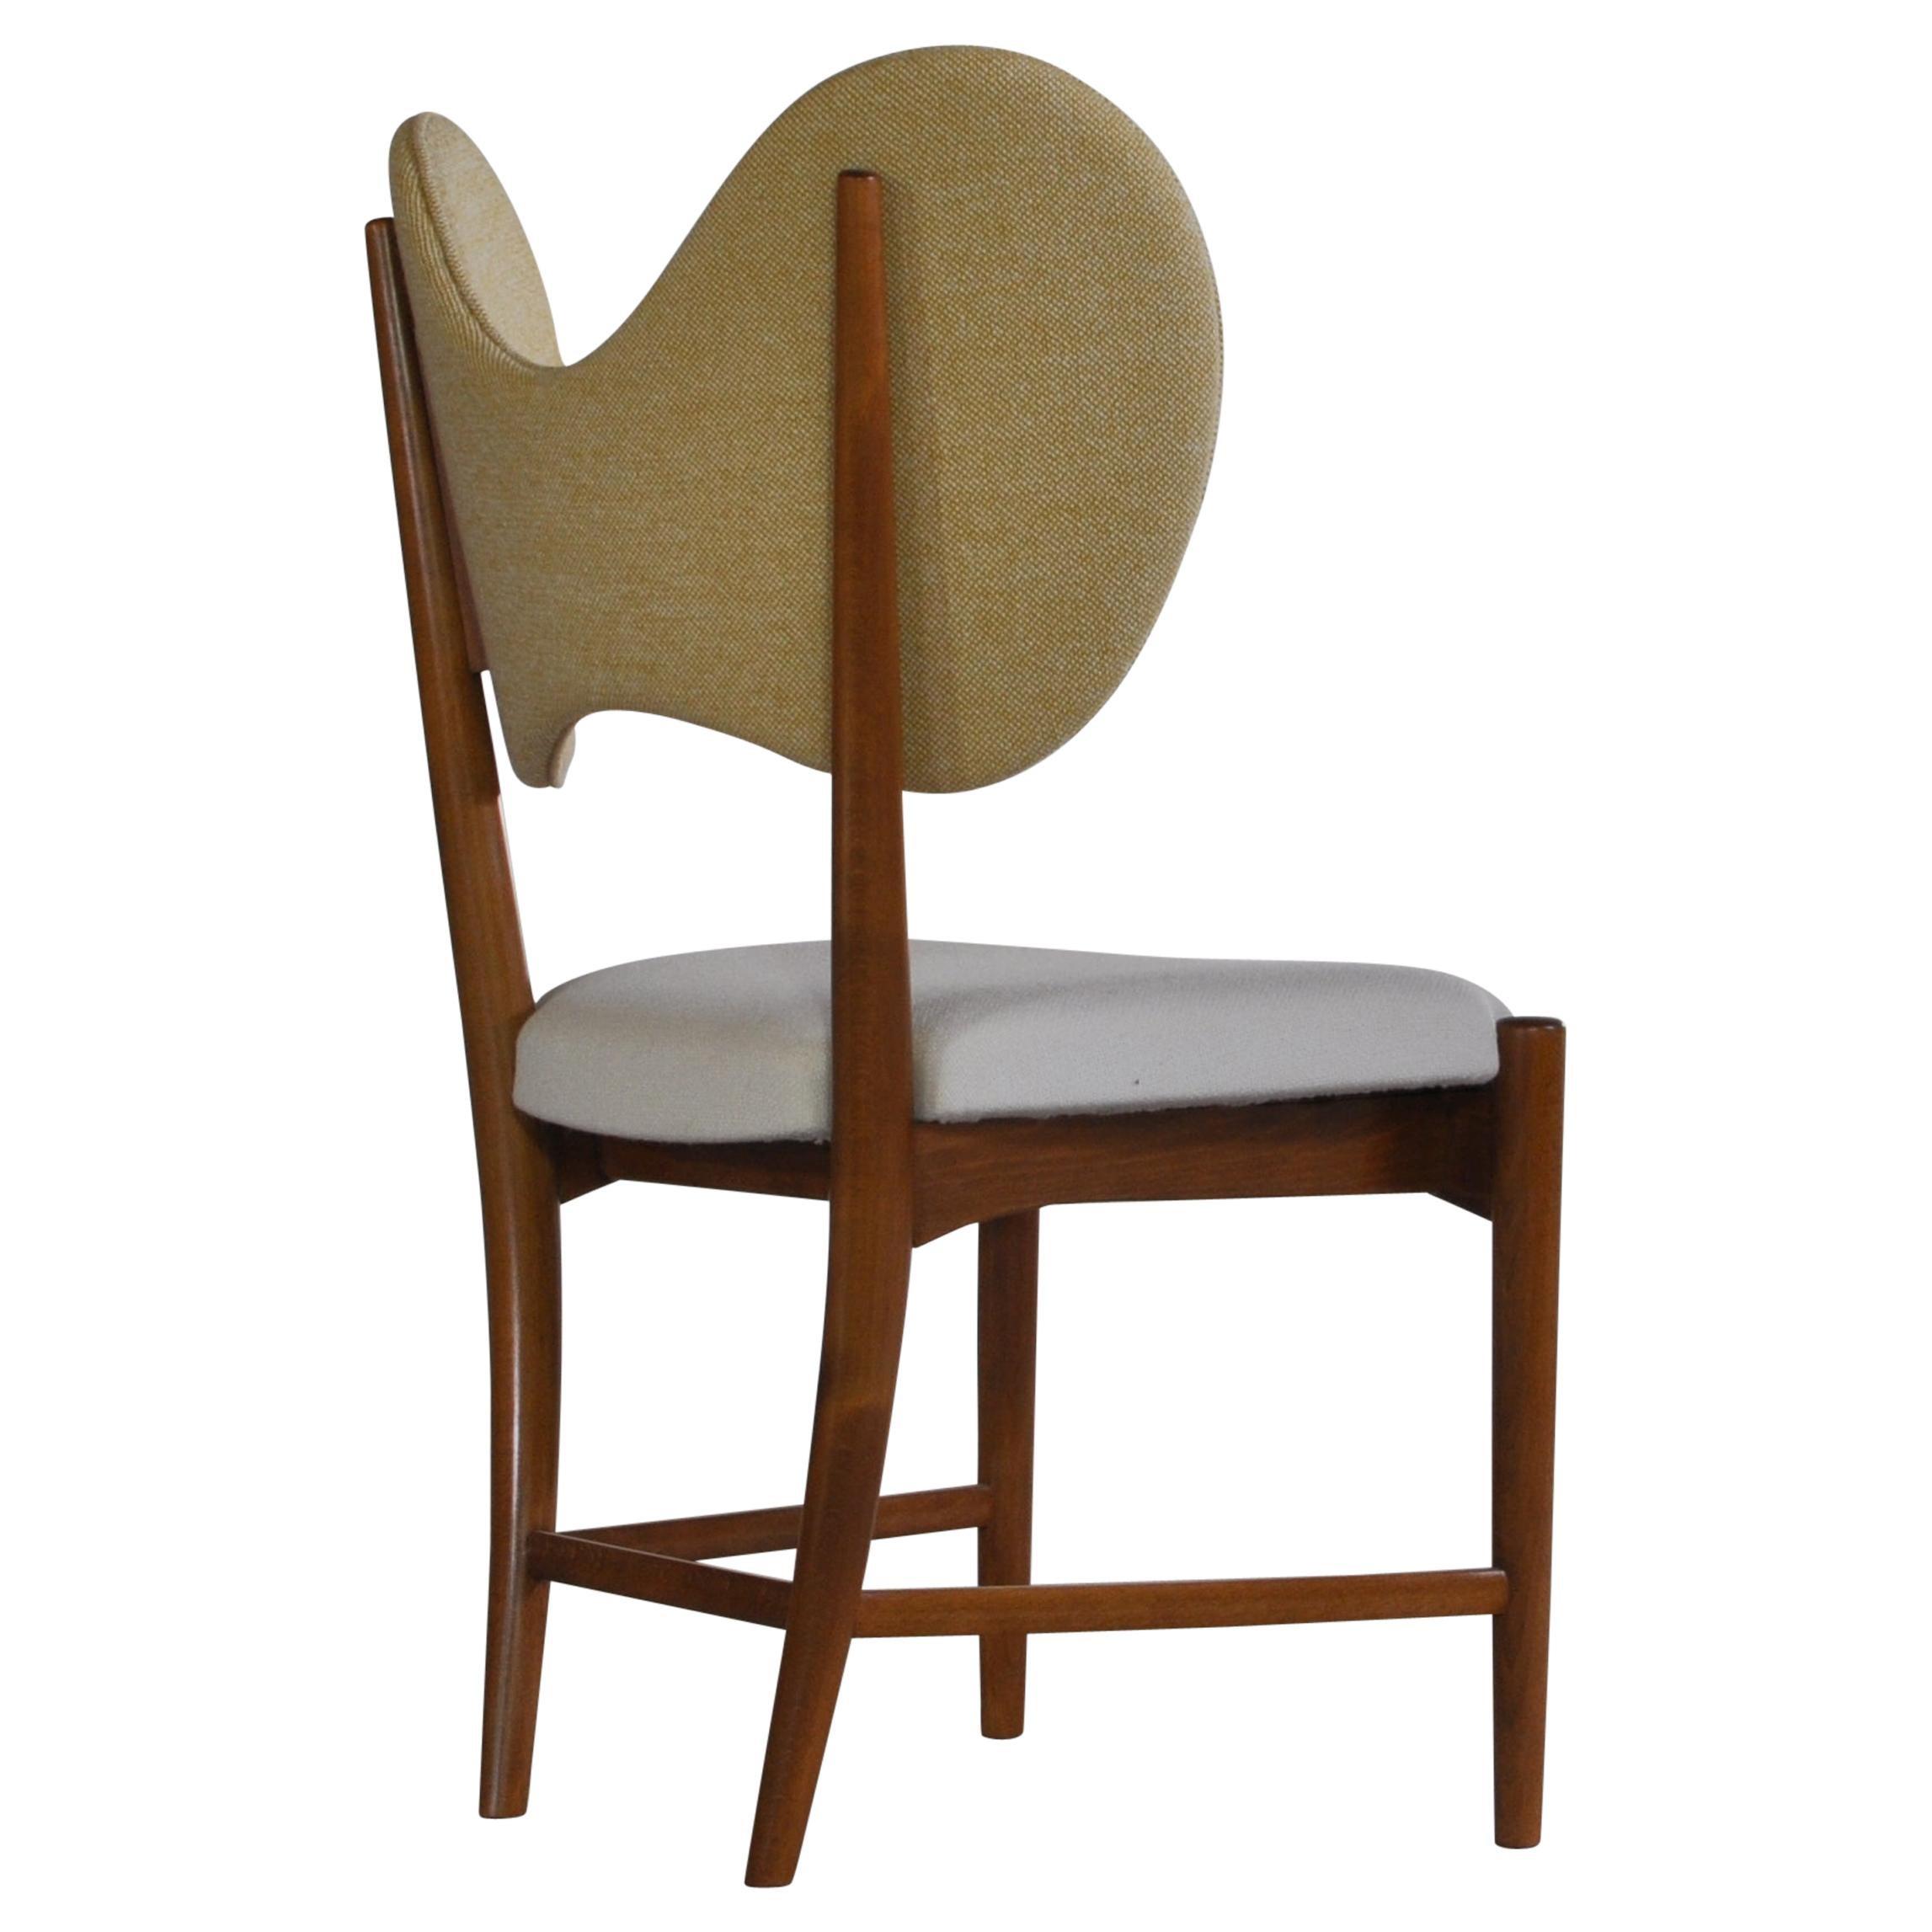 "Sculptural ""Butterfly"" Chair by Eva & Nils Koppel, Danish Modern, 1950s"